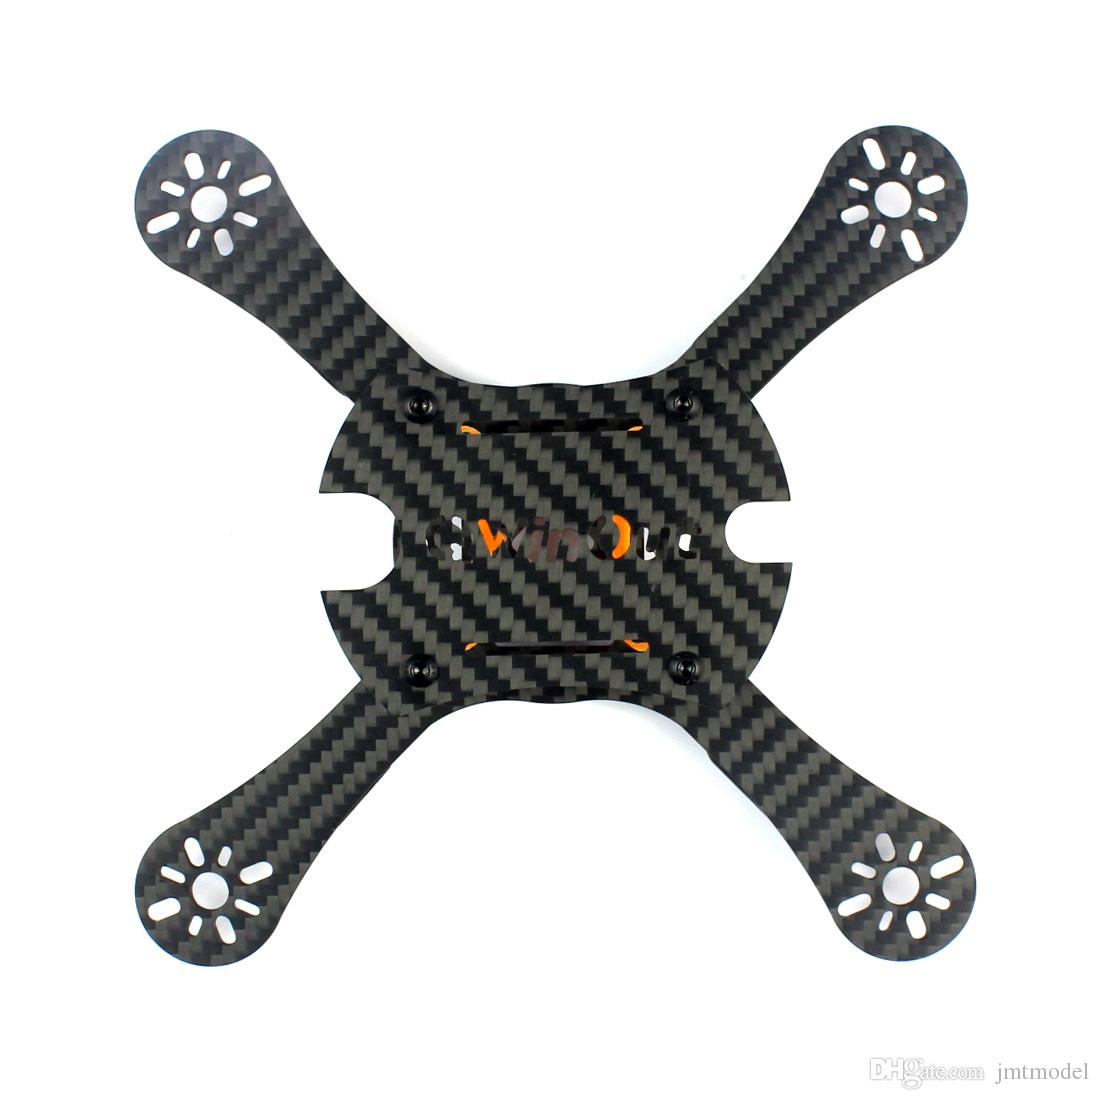 Großhandel F21890 Qwinout Q One 180mm Carbon Rahmen Kit X Form ...